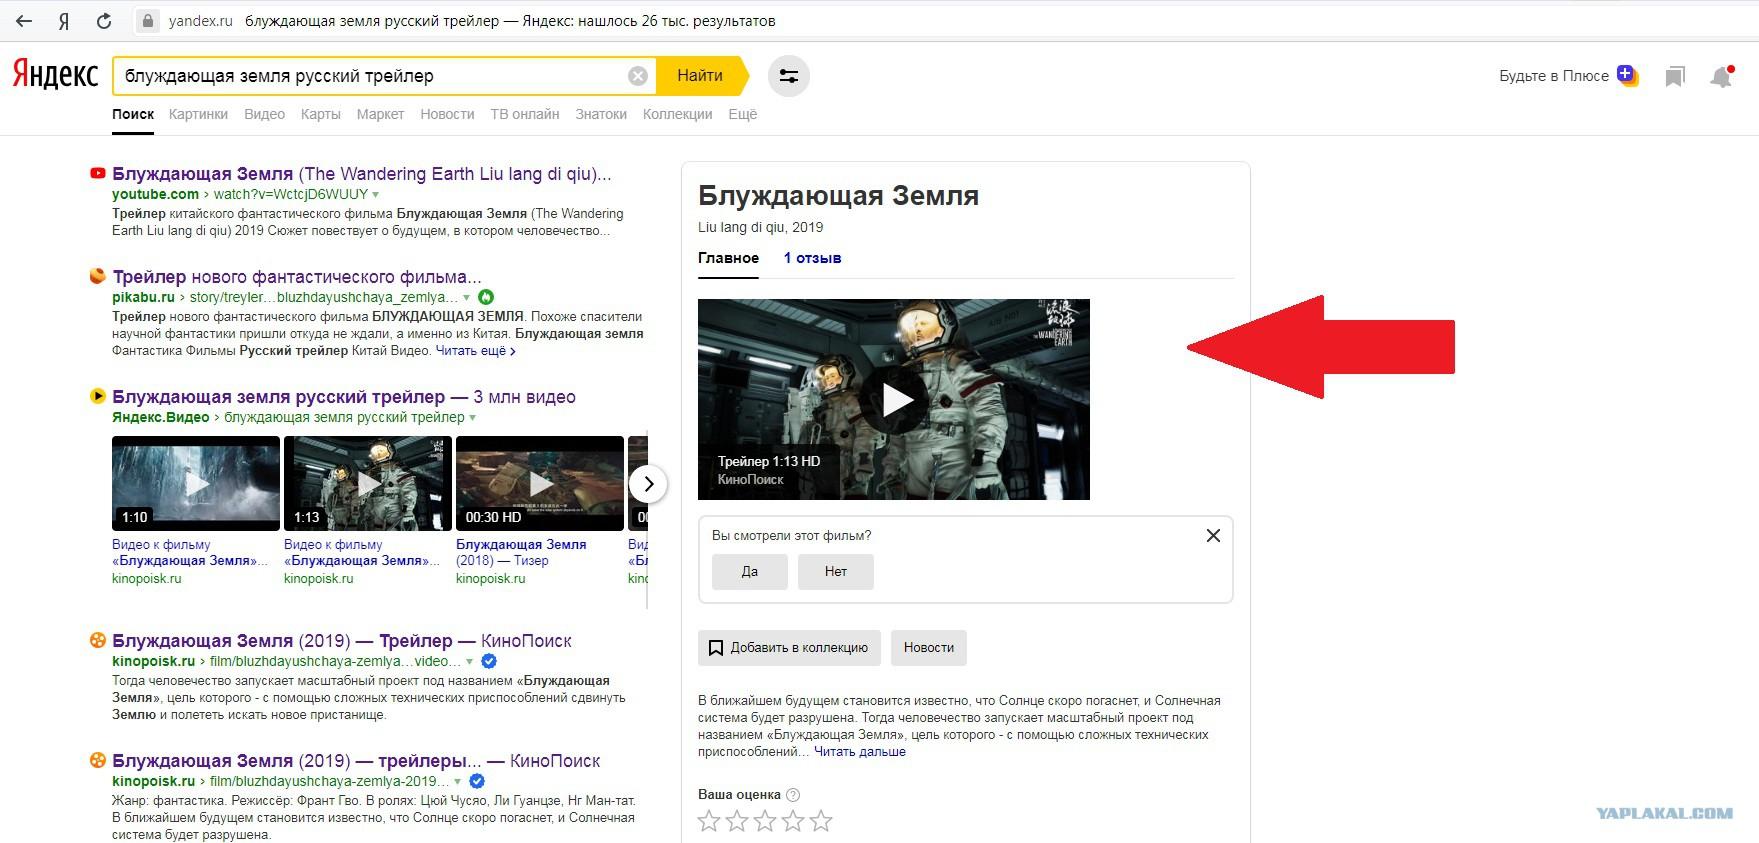 Ютуб канал 112 украина